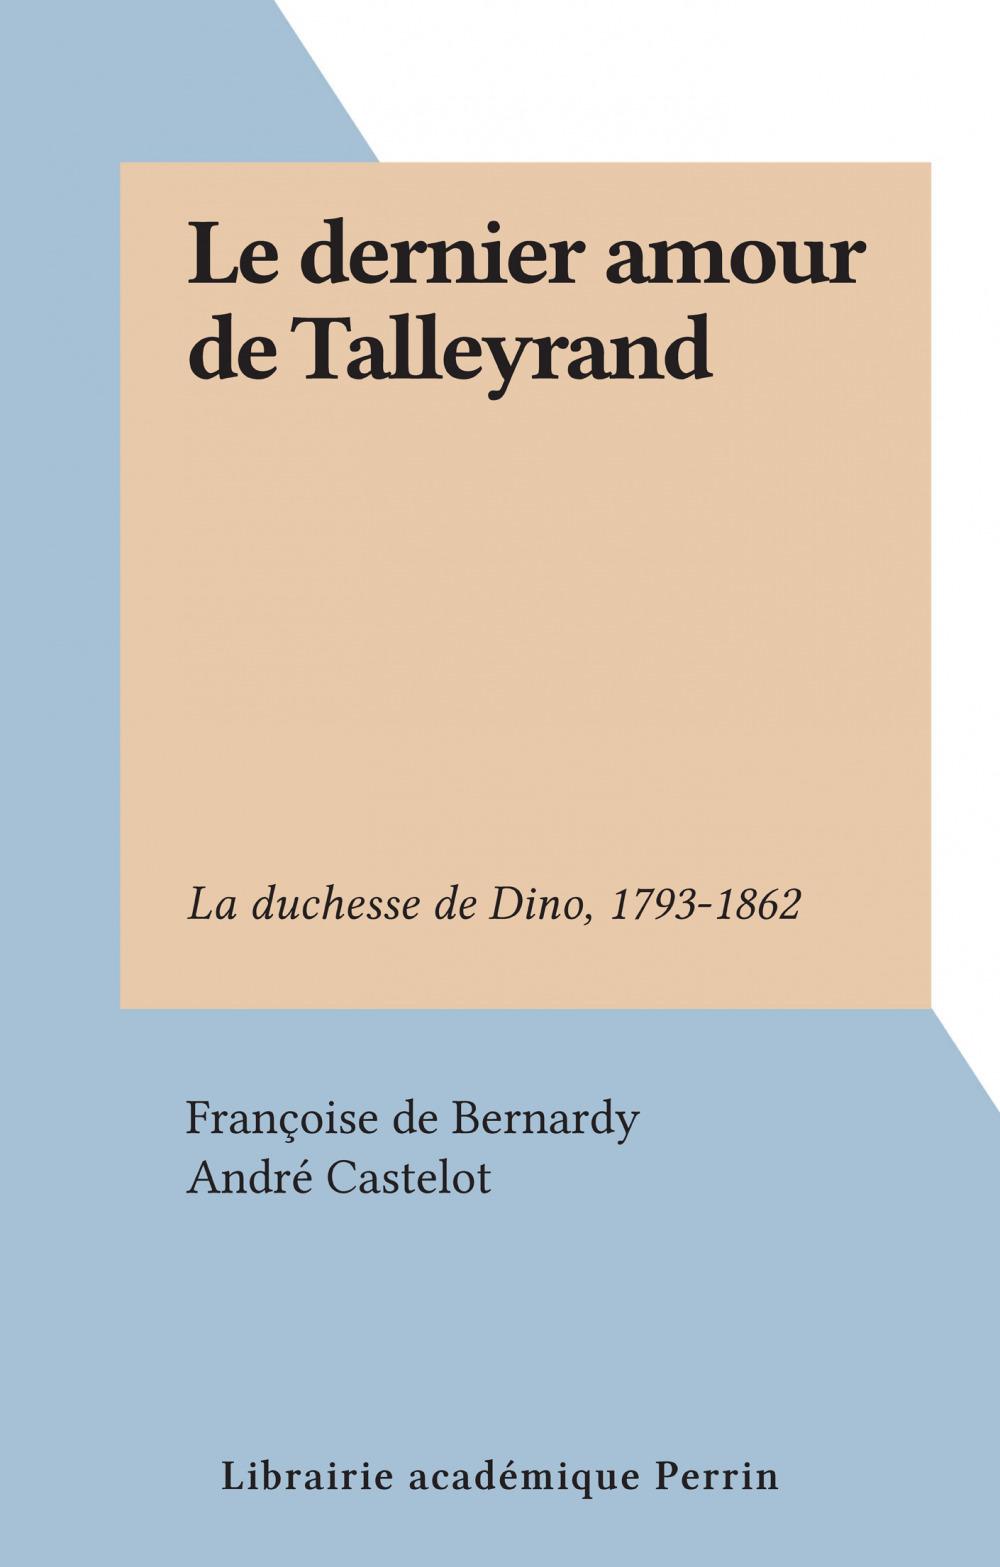 Le dernier amour de Talleyrand  - Françoise de Bernardy